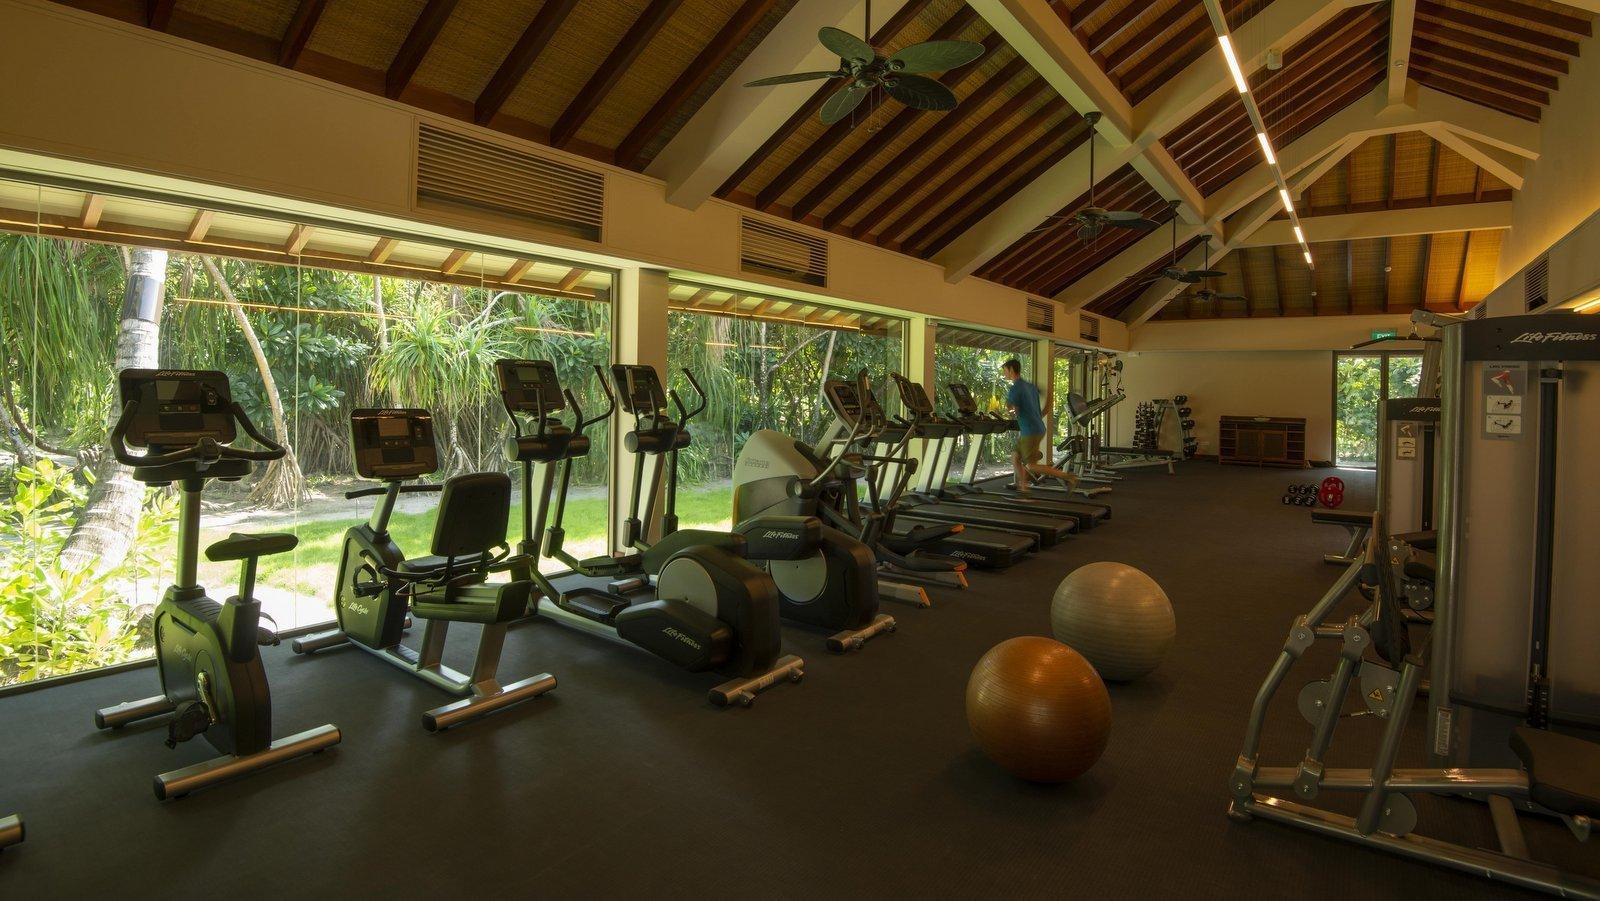 Мальдивы, отель The Residence Maldives at Dhigurah, фитнес центр